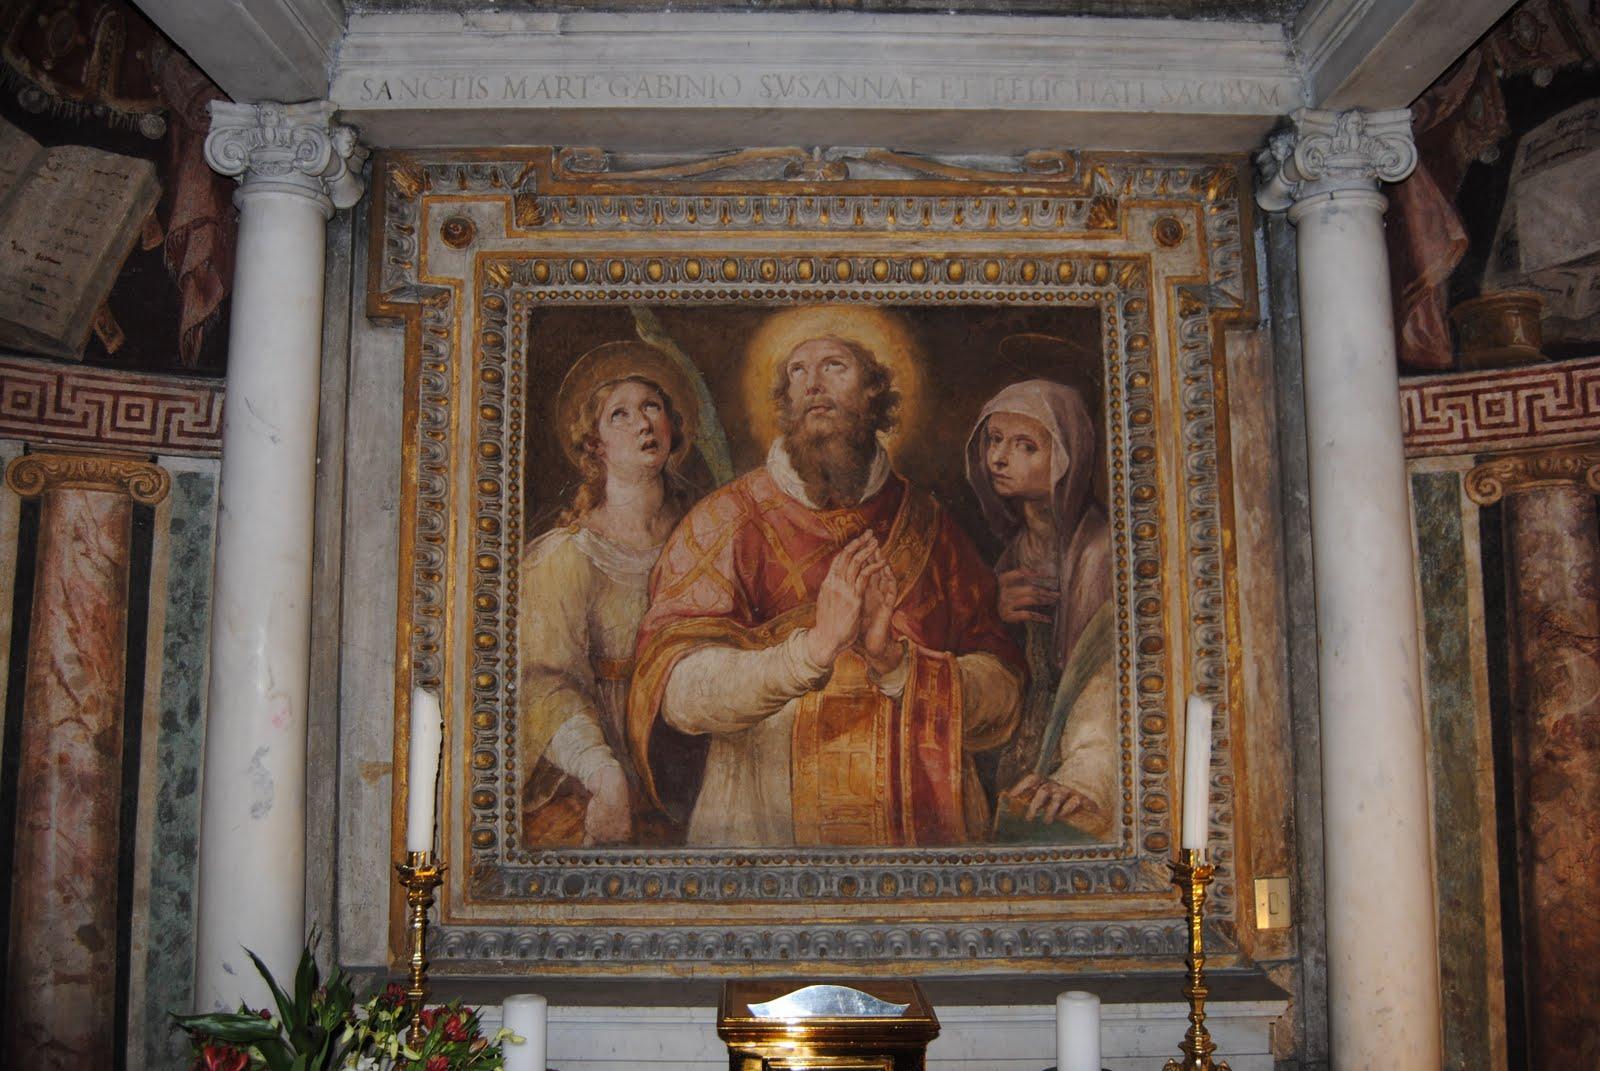 De hellige Gabinus, Susanna og Felicitas, fra Susannas grav i Santa Susanna